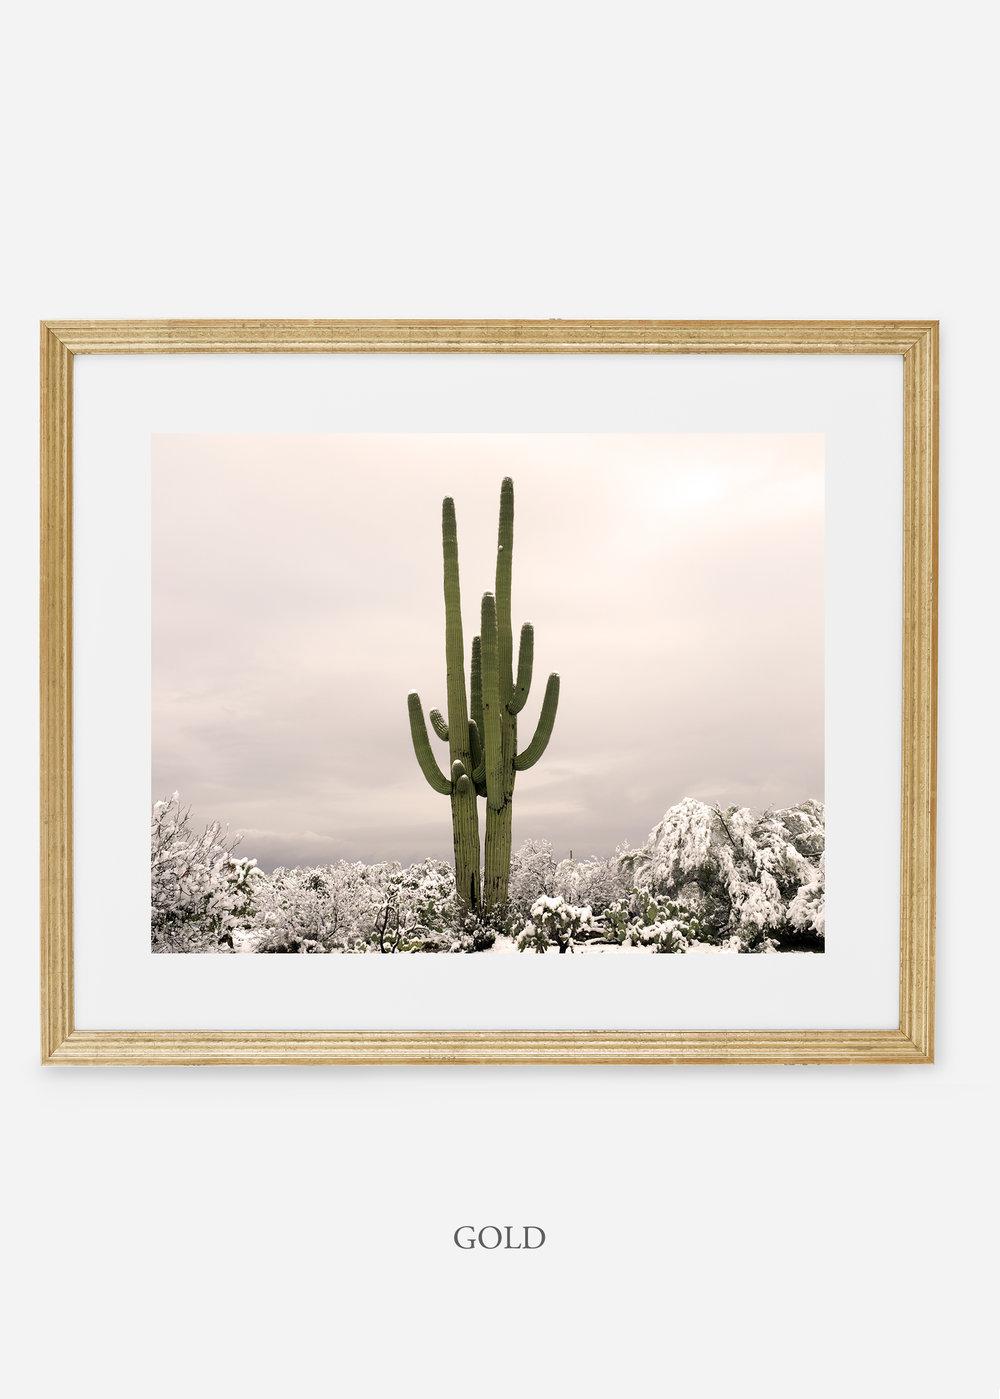 goldframe-saguaroNo.5-wildercalifornia-art-wallart-cactusprint-homedecor-prints-arizona-botanical-artwork-interiordesign.jpg